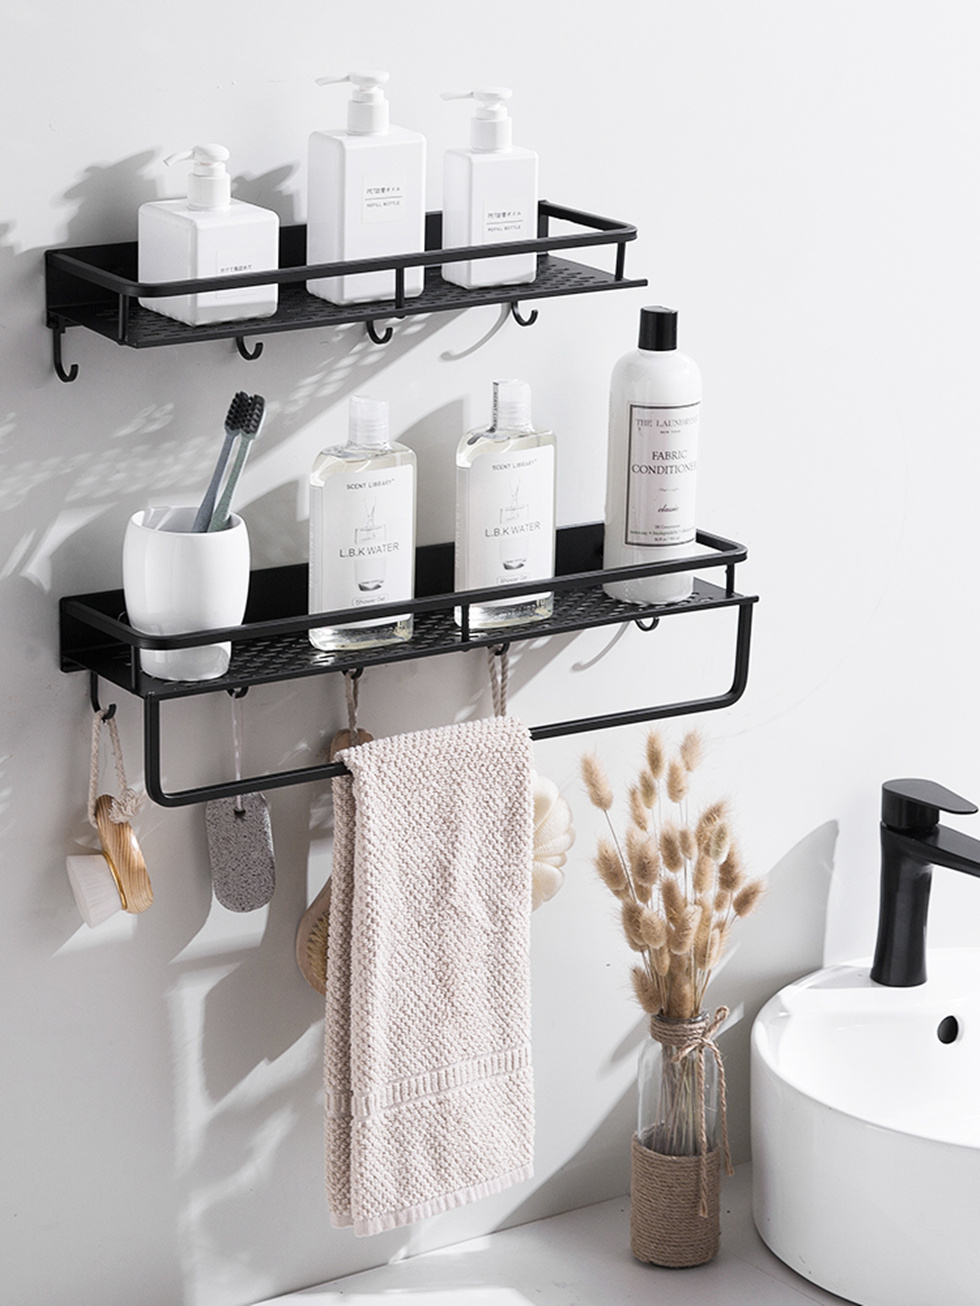 Matt Black Wall Mounted Shelf Cookware Pantry Storage Organizer Kitchen Pantry Bathroom Pot Pan Rack With 6 Hooks Accessory Bathroom Shelves Aliexpress